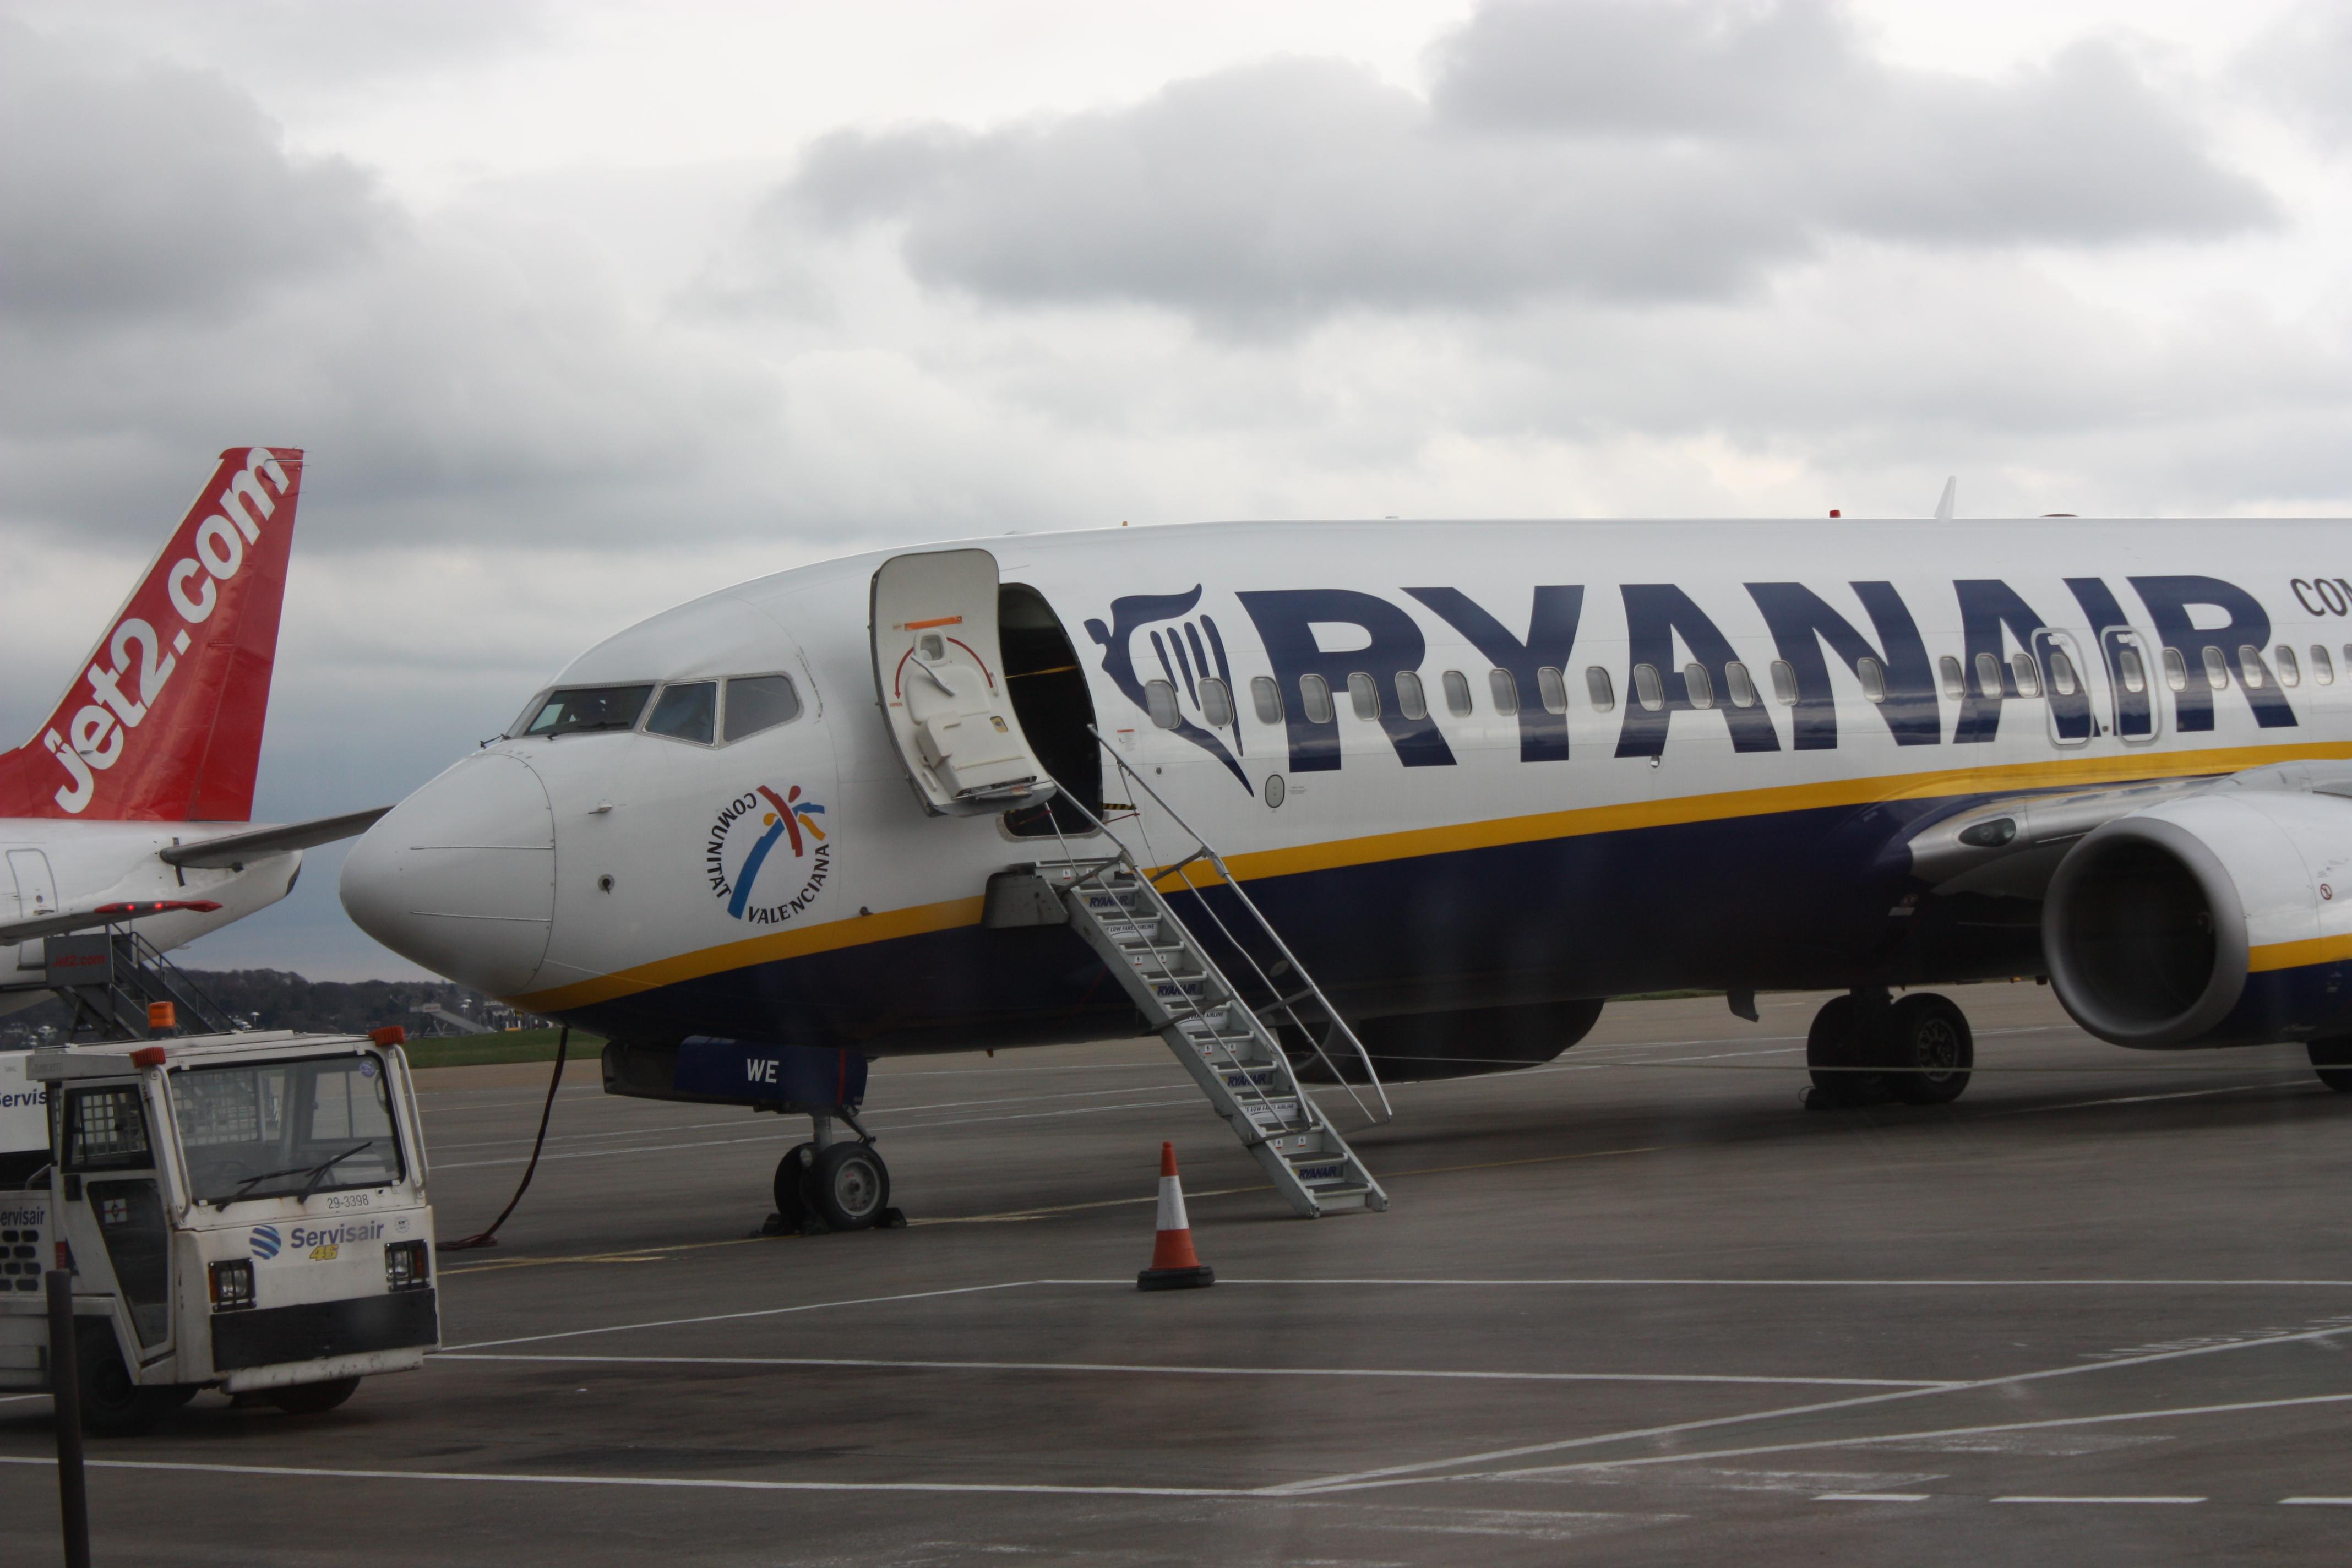 Пассажиру рейса Ryanair удалось отснять на видео жесткую посадку лайнера Boeing - кадры